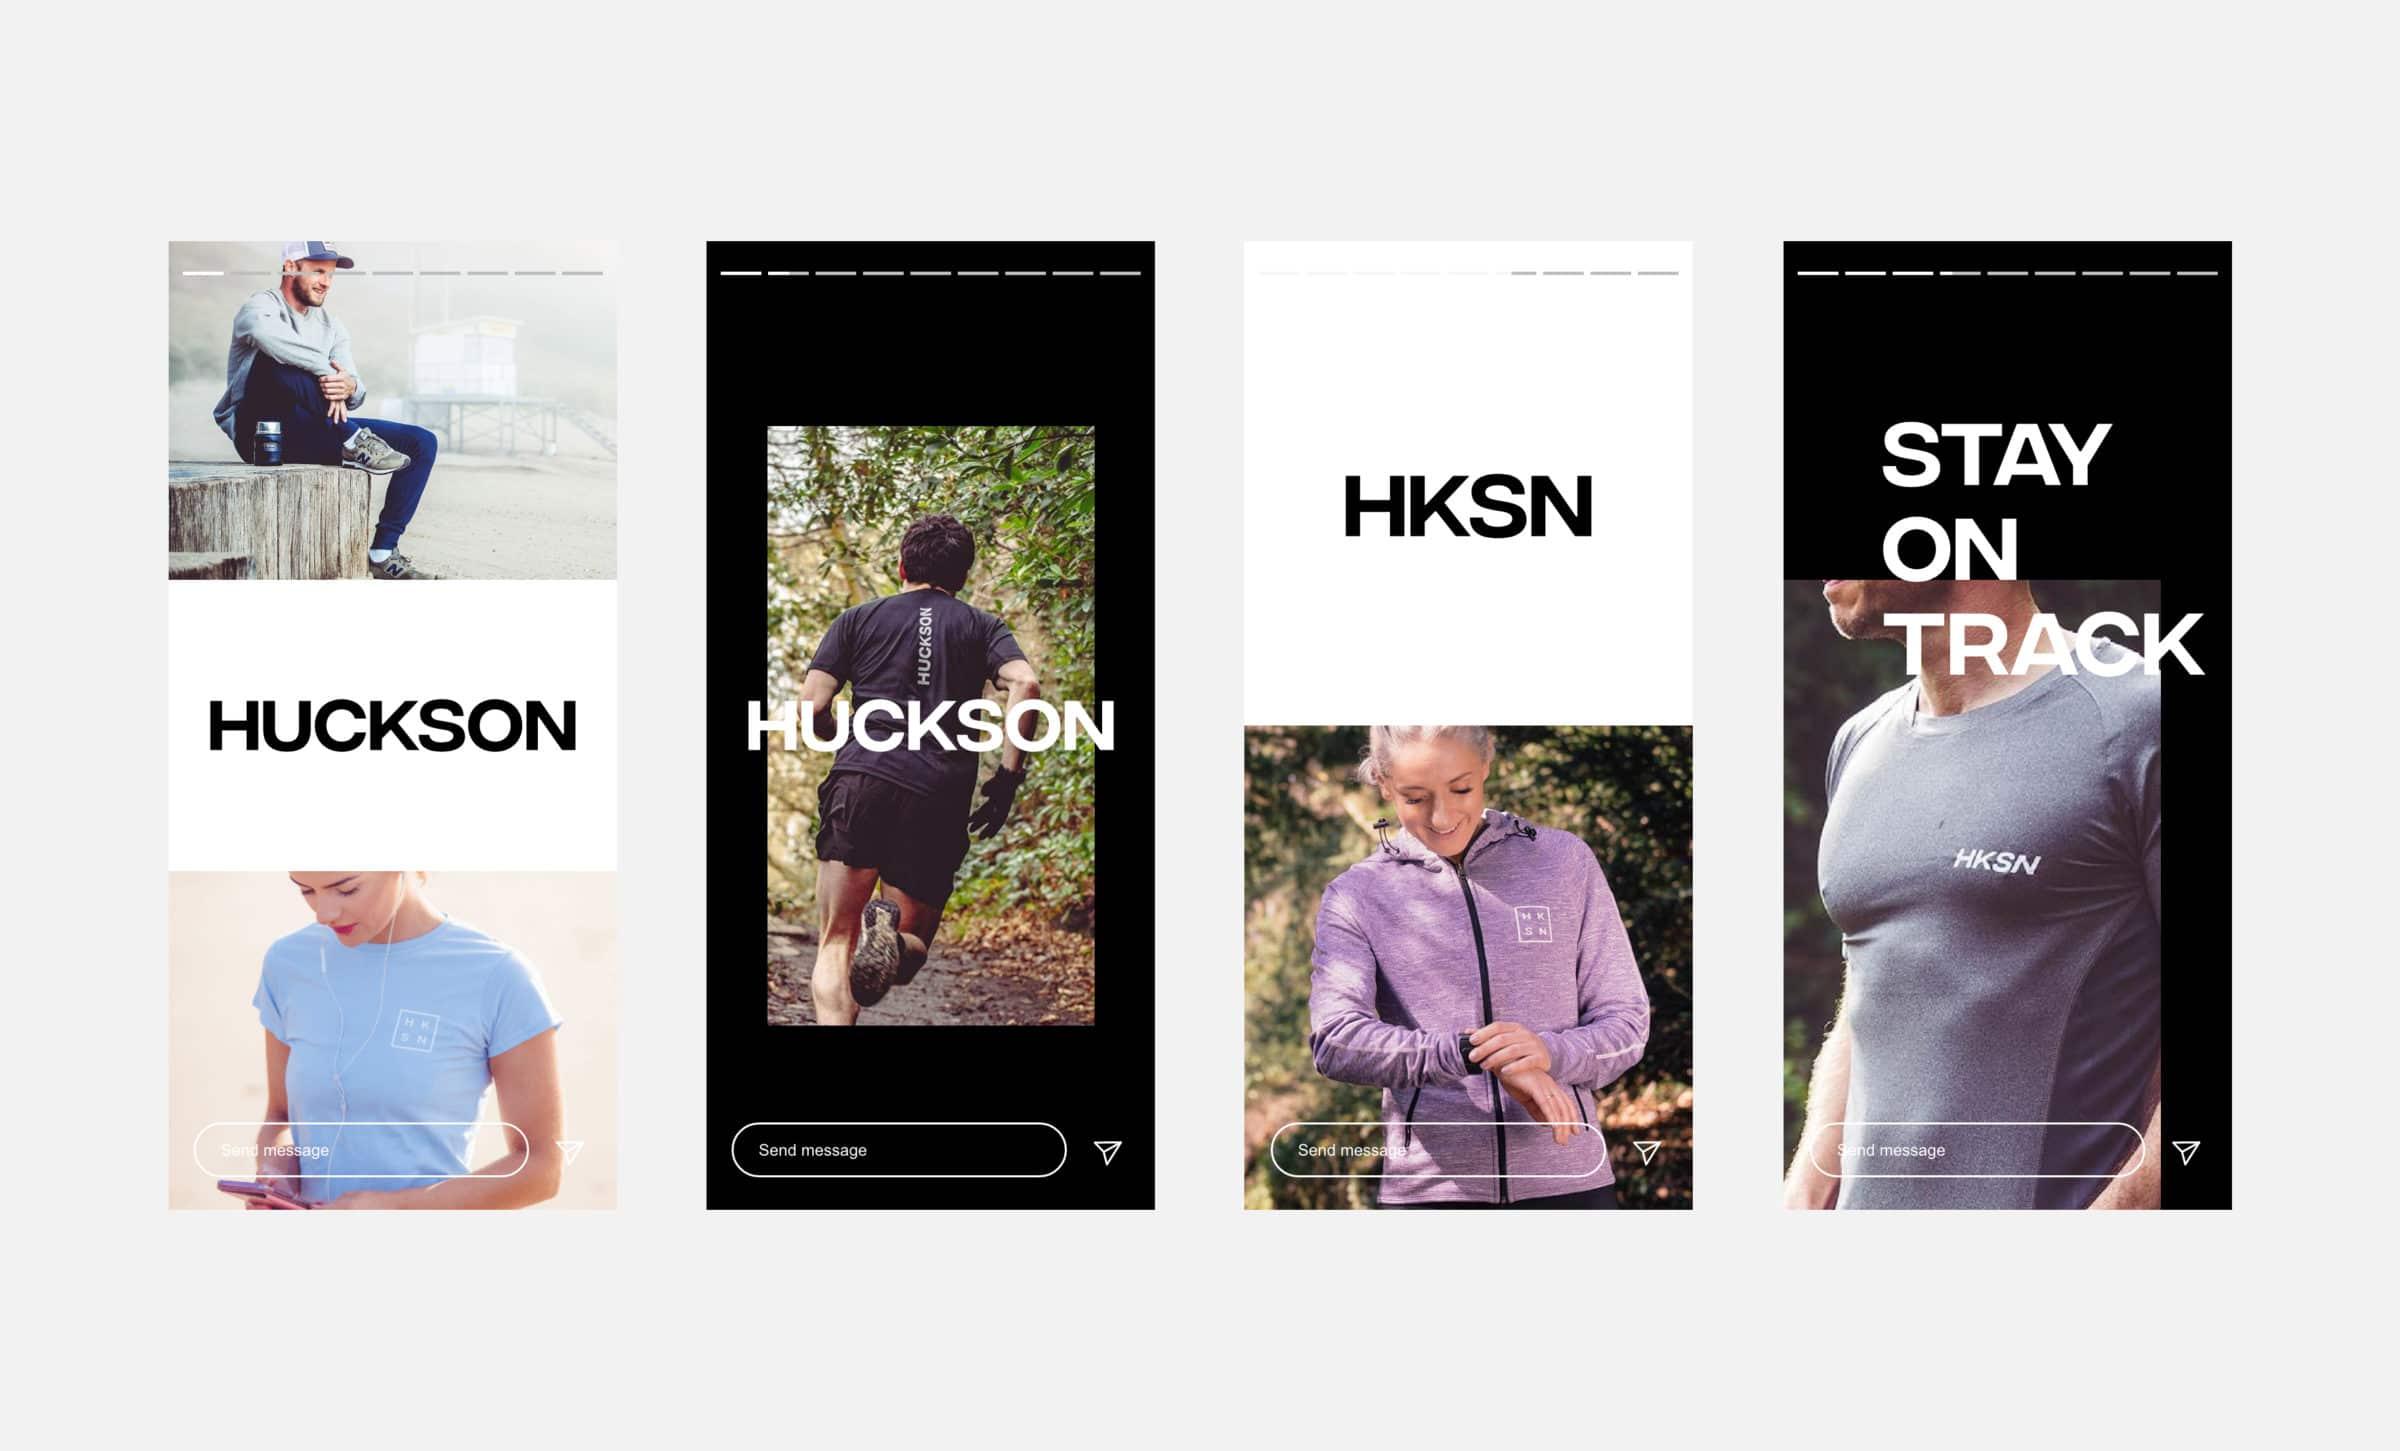 Huckson advertising